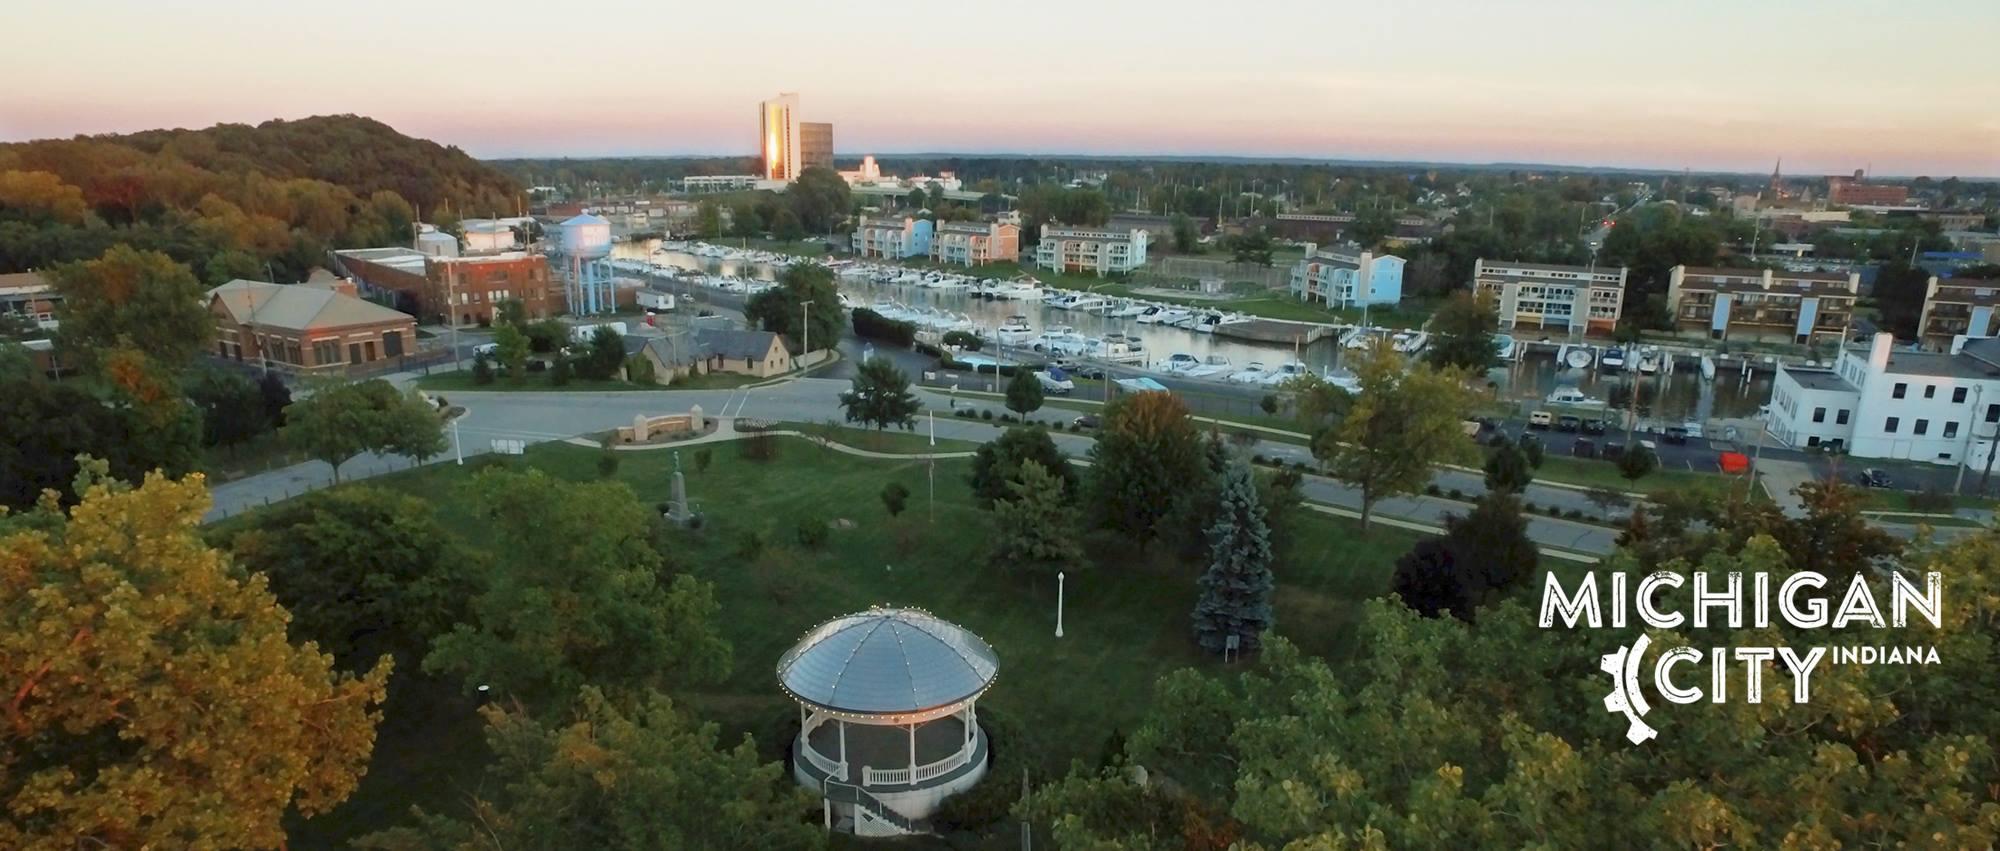 Michigan City Announces 2017 Mosquito Spraying